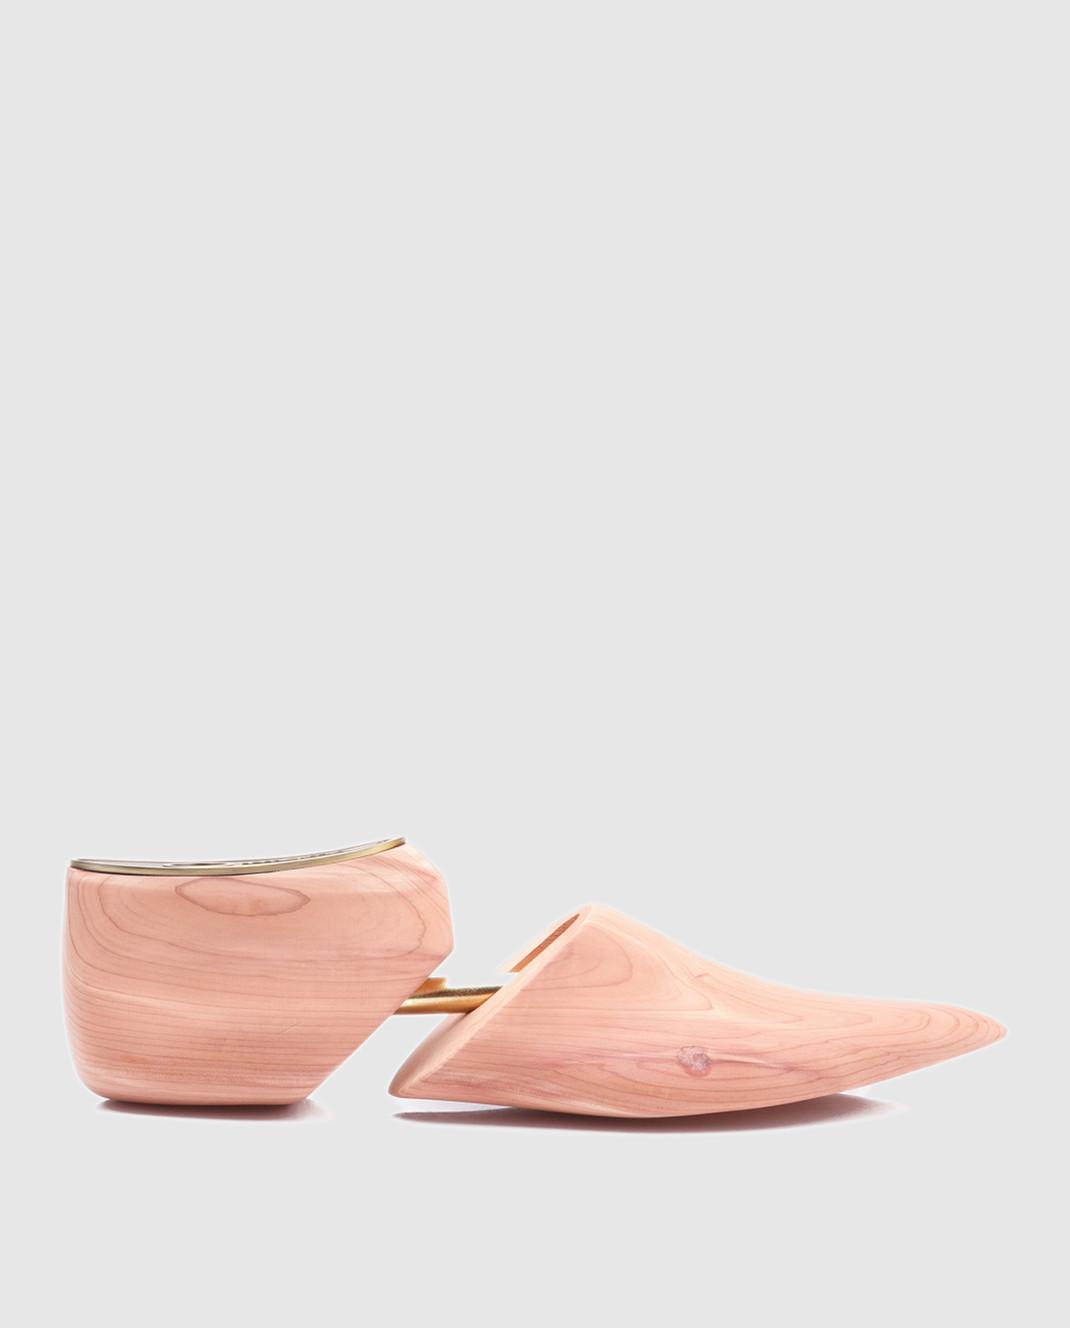 Santoni Бежевая колодка для обуви  из кедра UFAAA1069